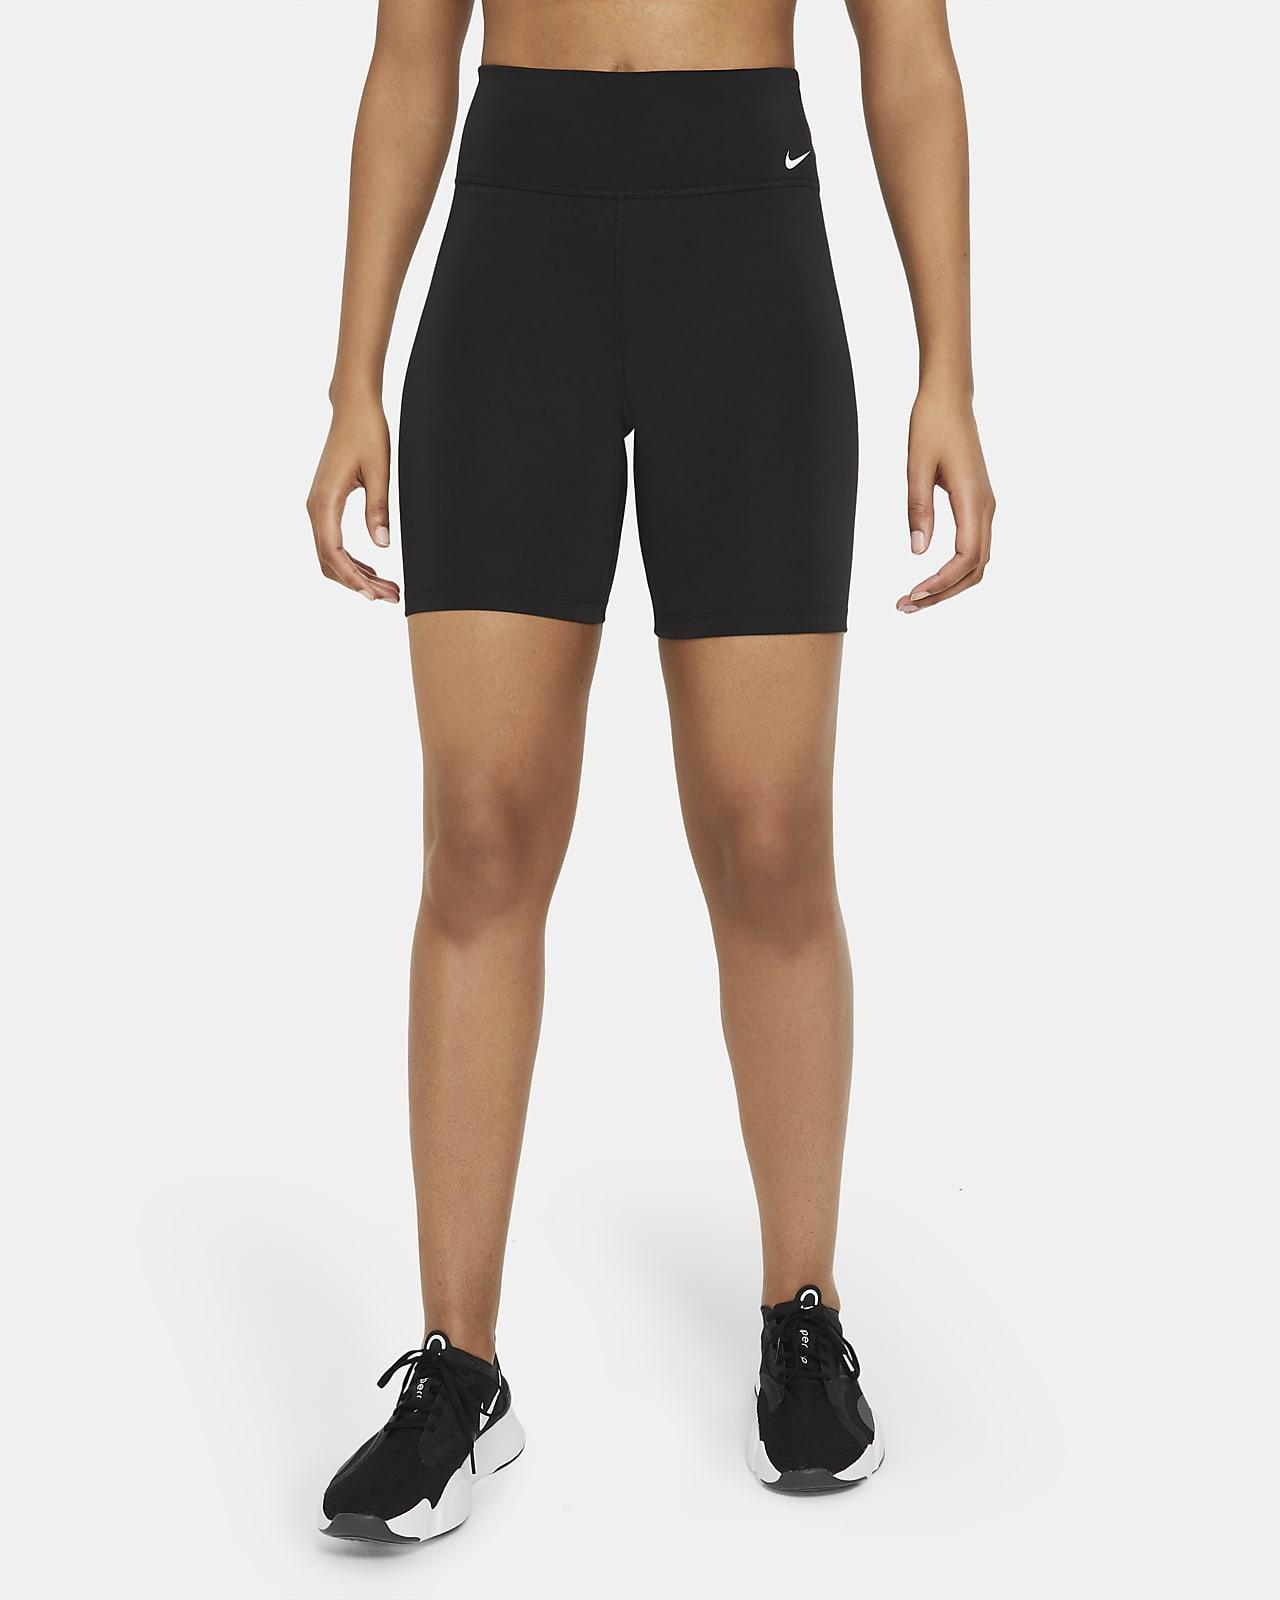 Nike One Pantalons curts amb cintura mitjana de 18 cm - Dona